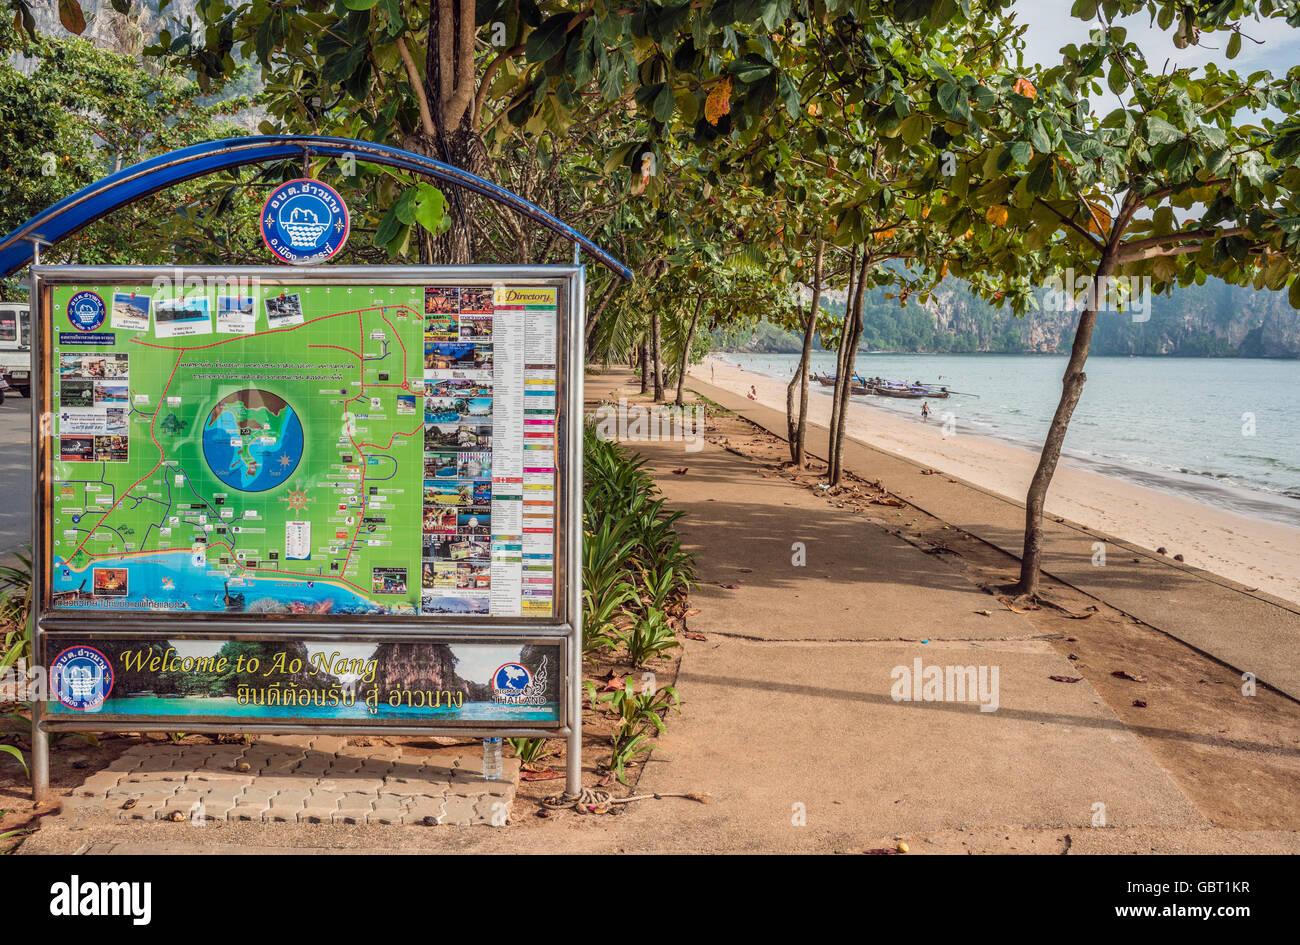 Tourist Map at Ao Nang Beach near Krabi, Thailand | Touristen-Karte am Strand von Ao Nang, Thailand - Stock Image